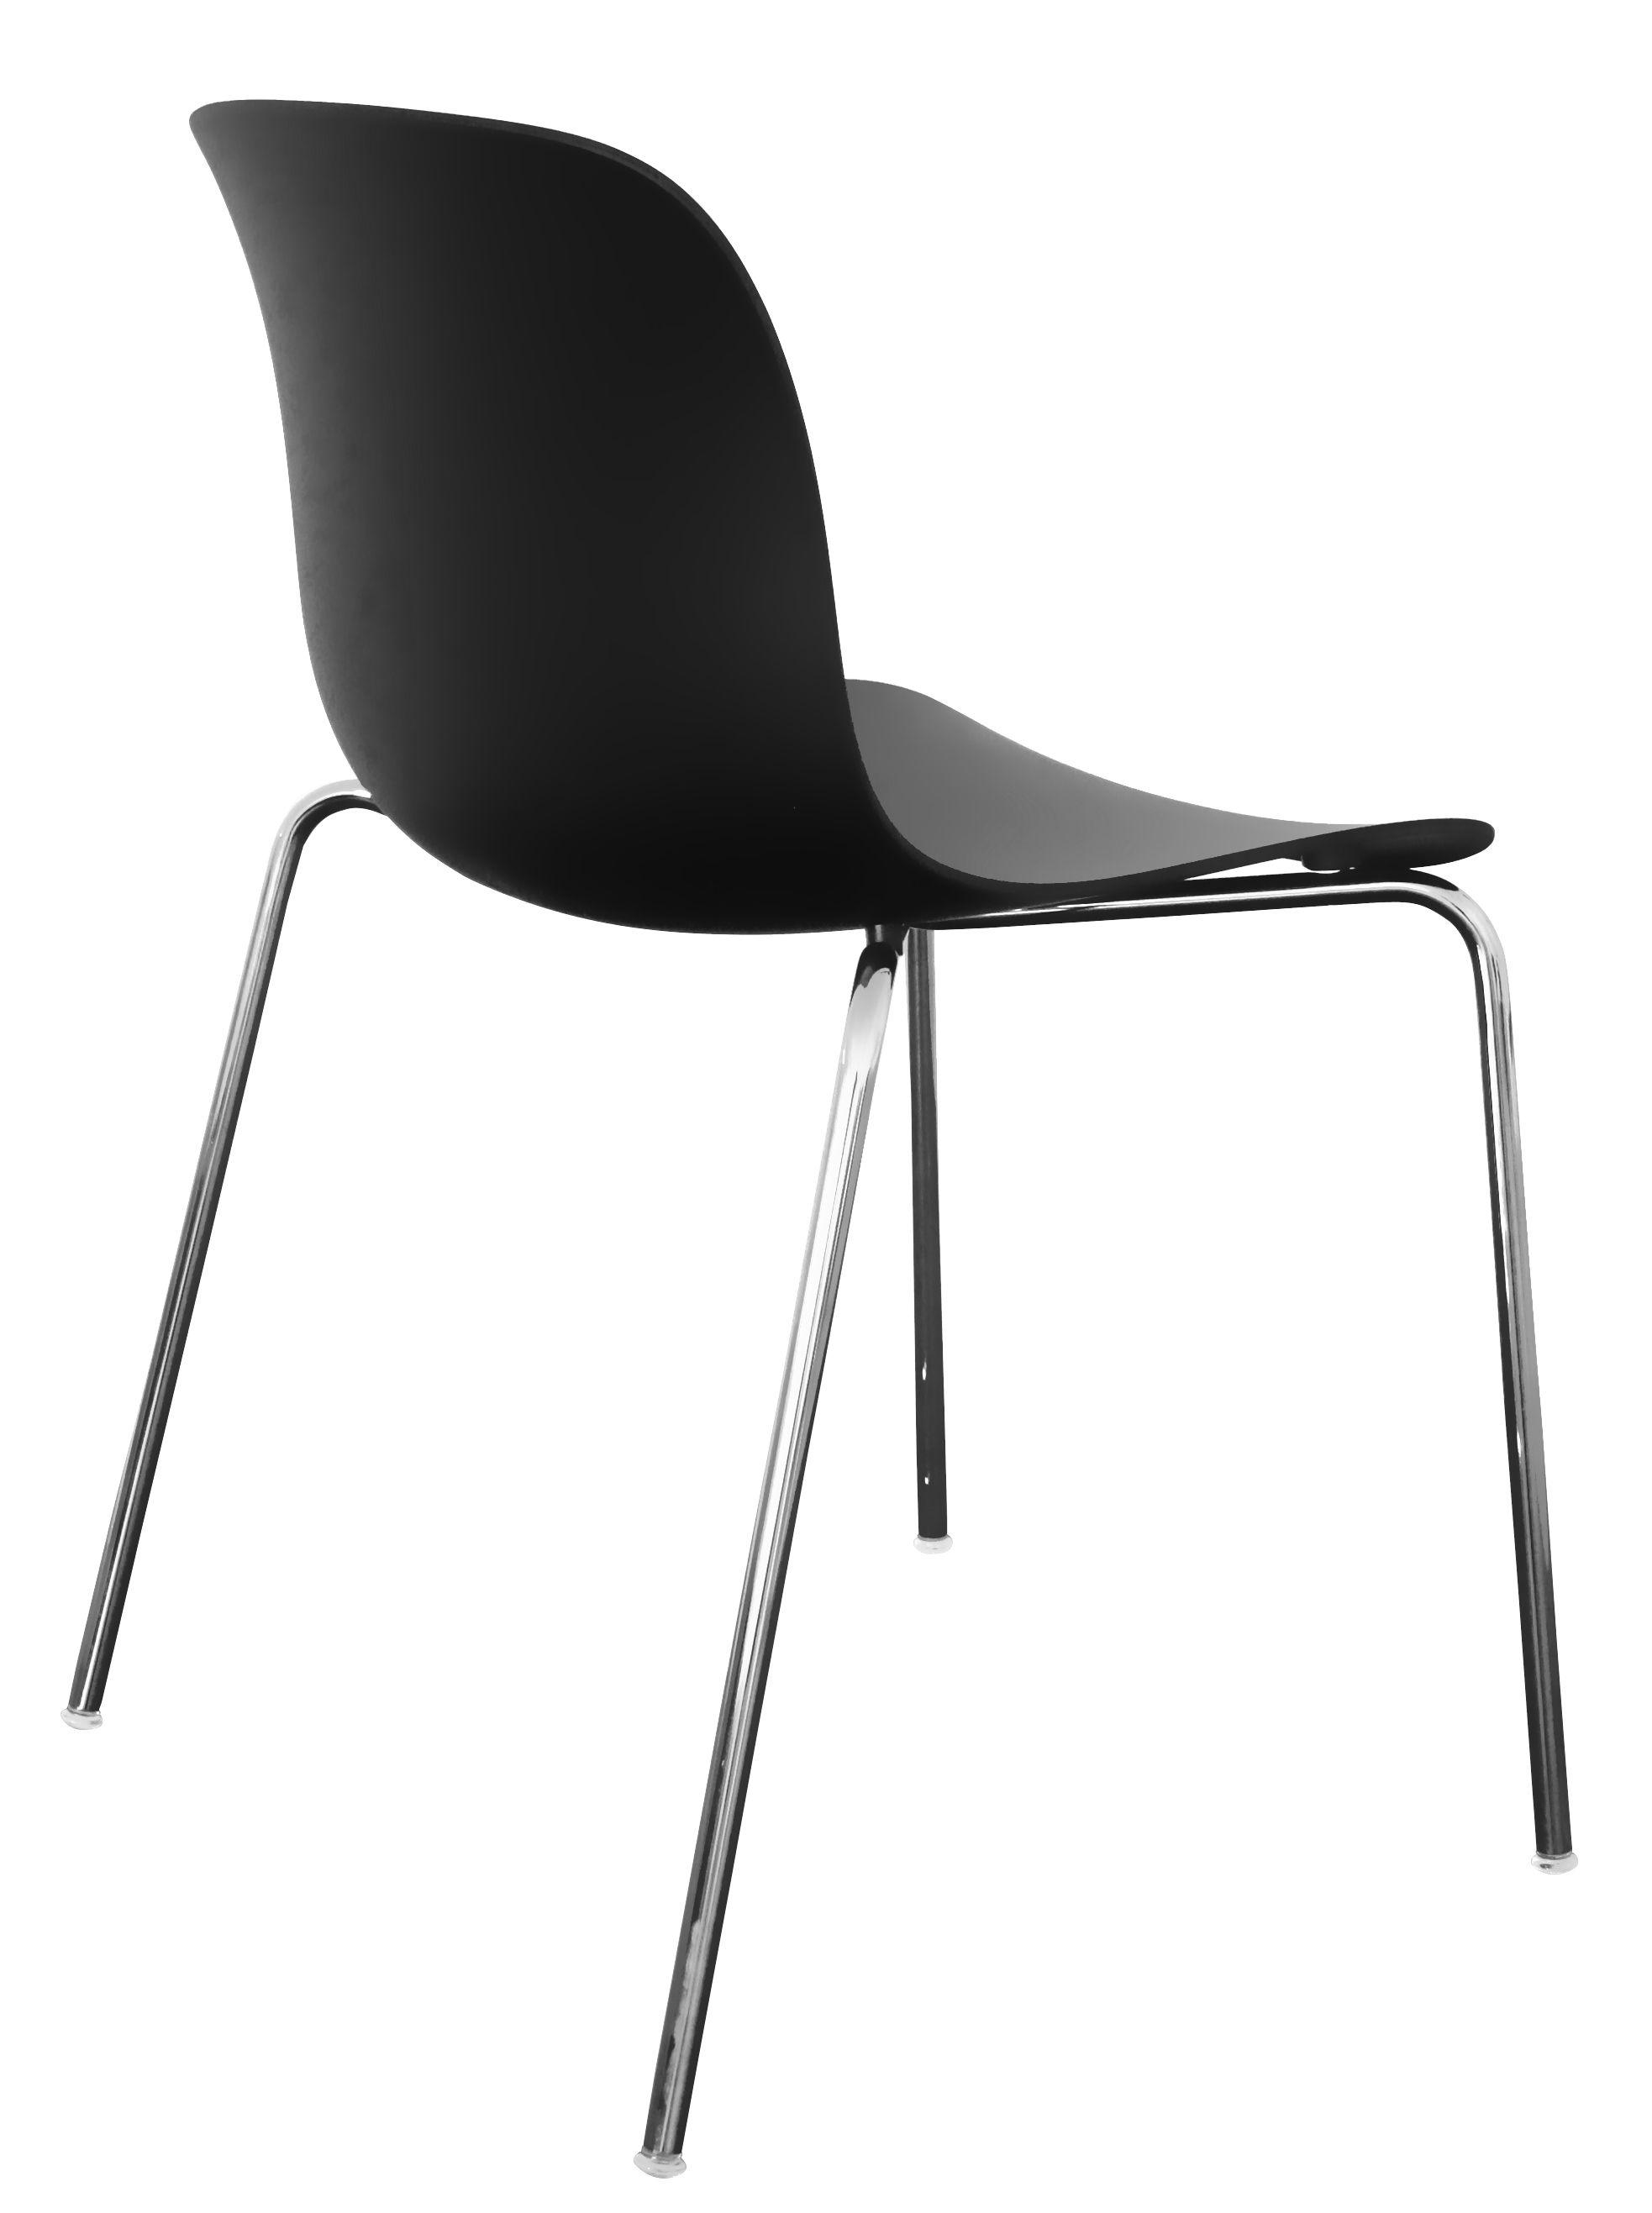 Möbel - Stühle  - Troy Stapelbarer Stuhl / Kunststoff - 4 Stuhlbeine - Magis - Schwarz / Stuhlbeine chrom-glänzend - Polypropylen, verchromter Stahl